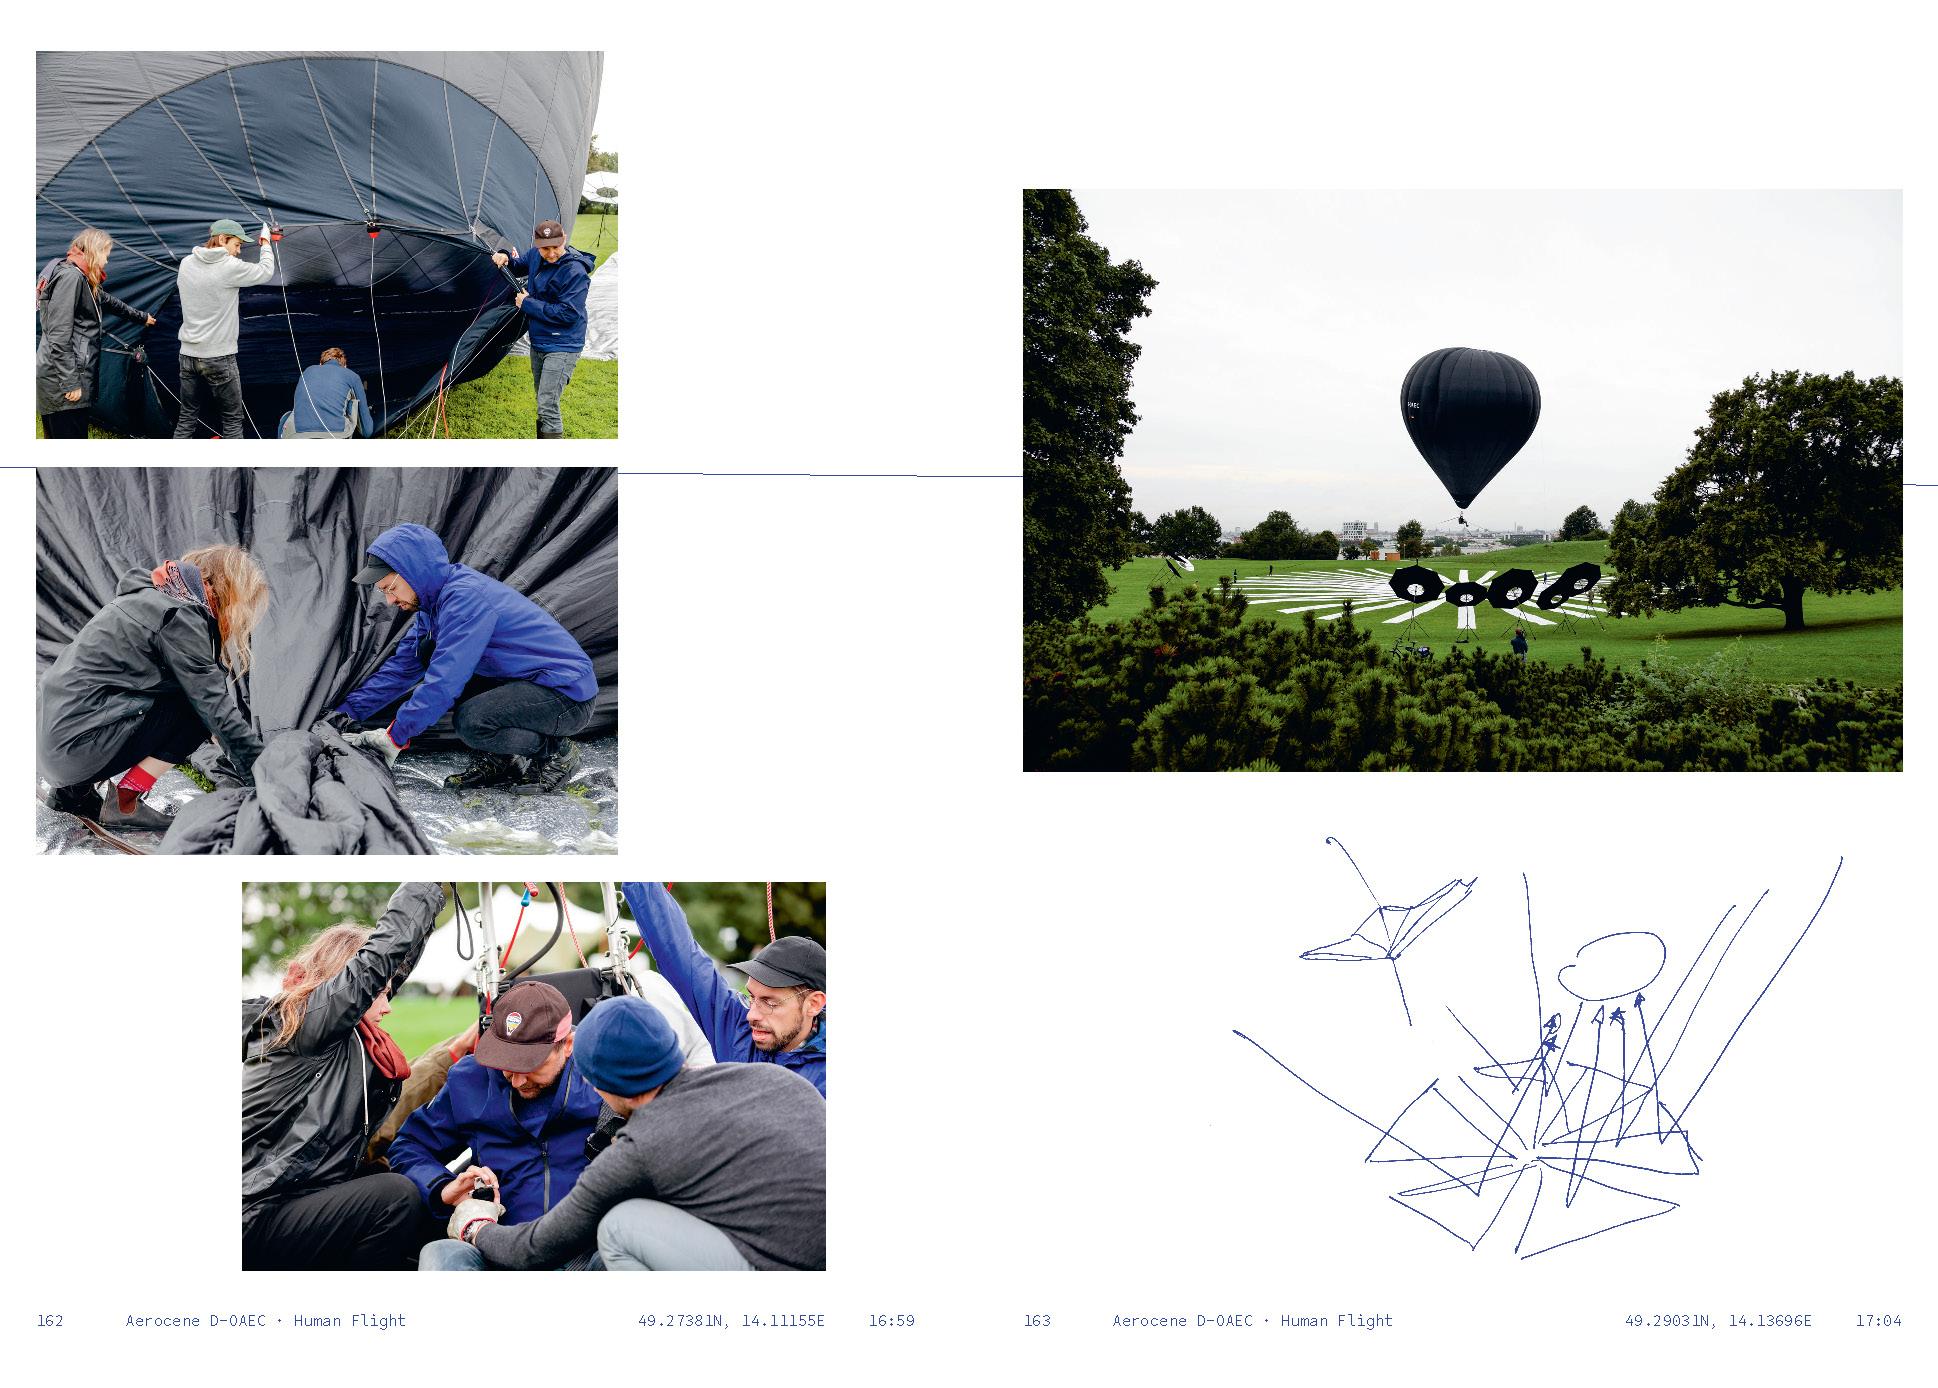 20AE_MovementsfortheAir_Aerocene (1)_Page_082